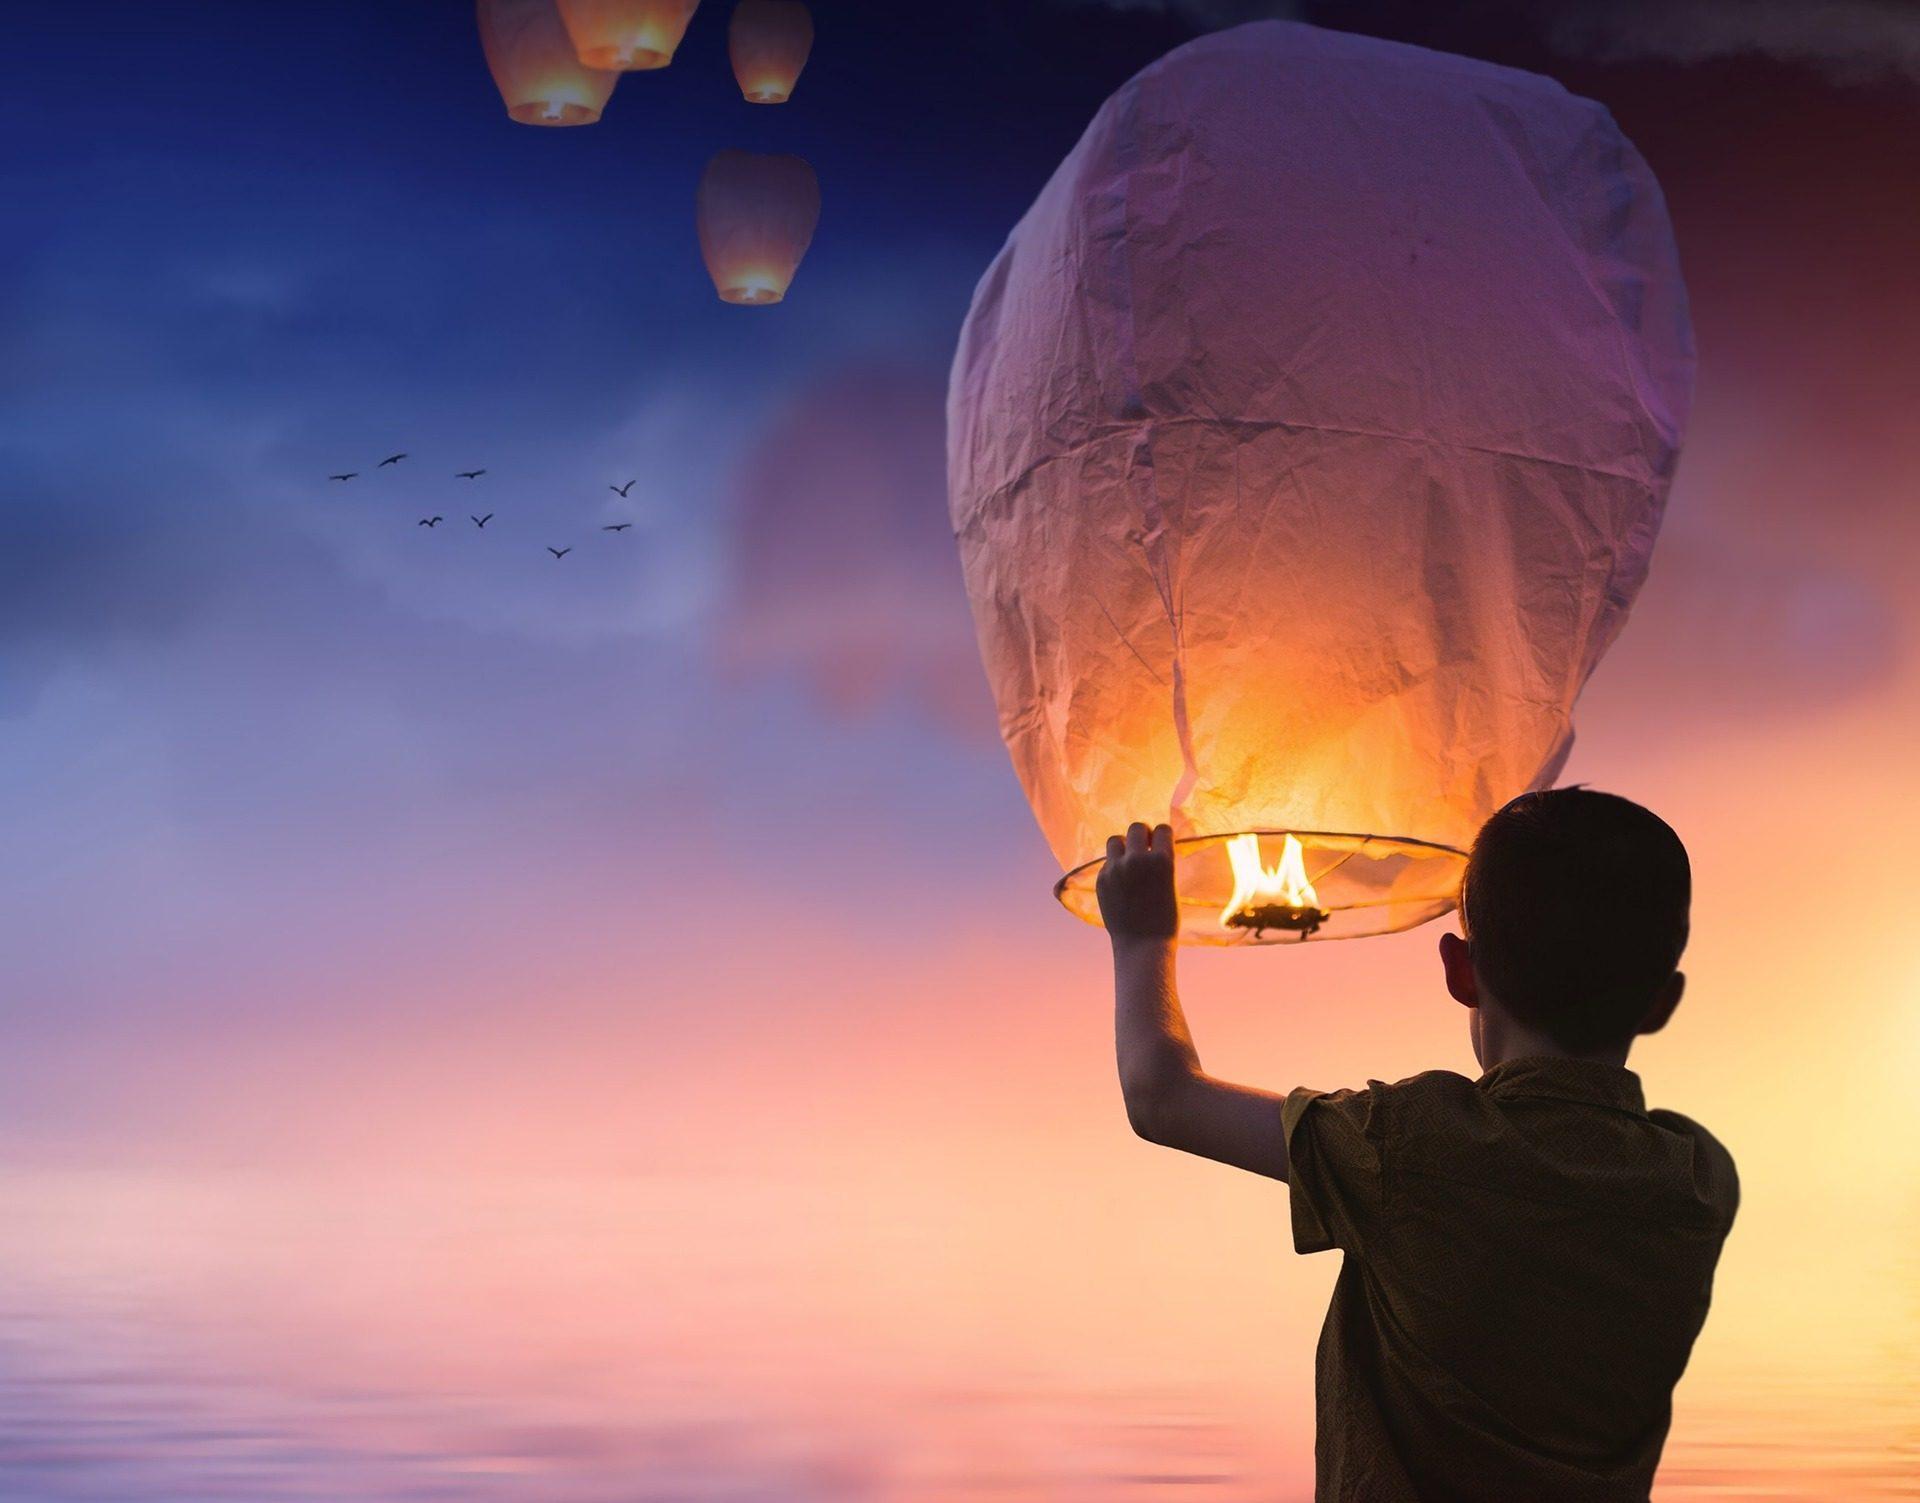 niño, vela, globo, lámpara, volar, deseos - Fondos de Pantalla HD - professor-falken.com